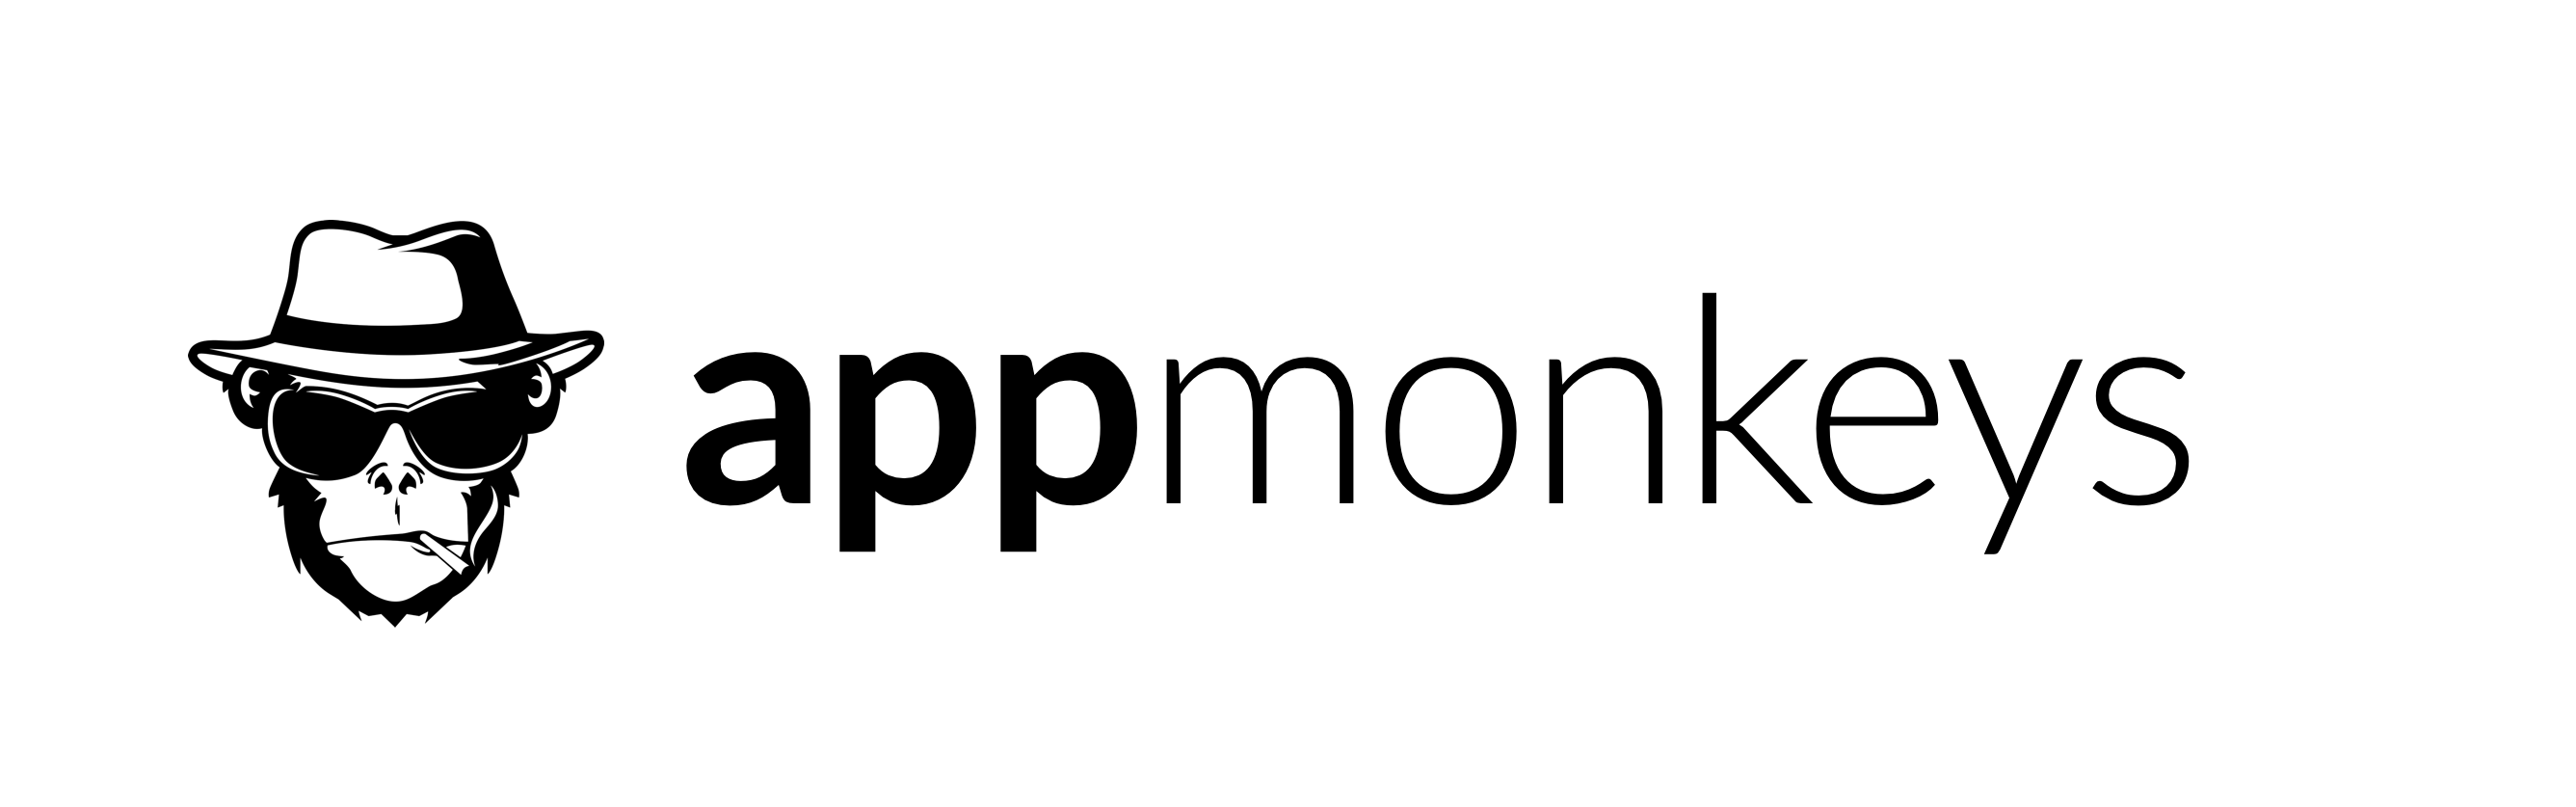 Logo des Startups AppMonkeys